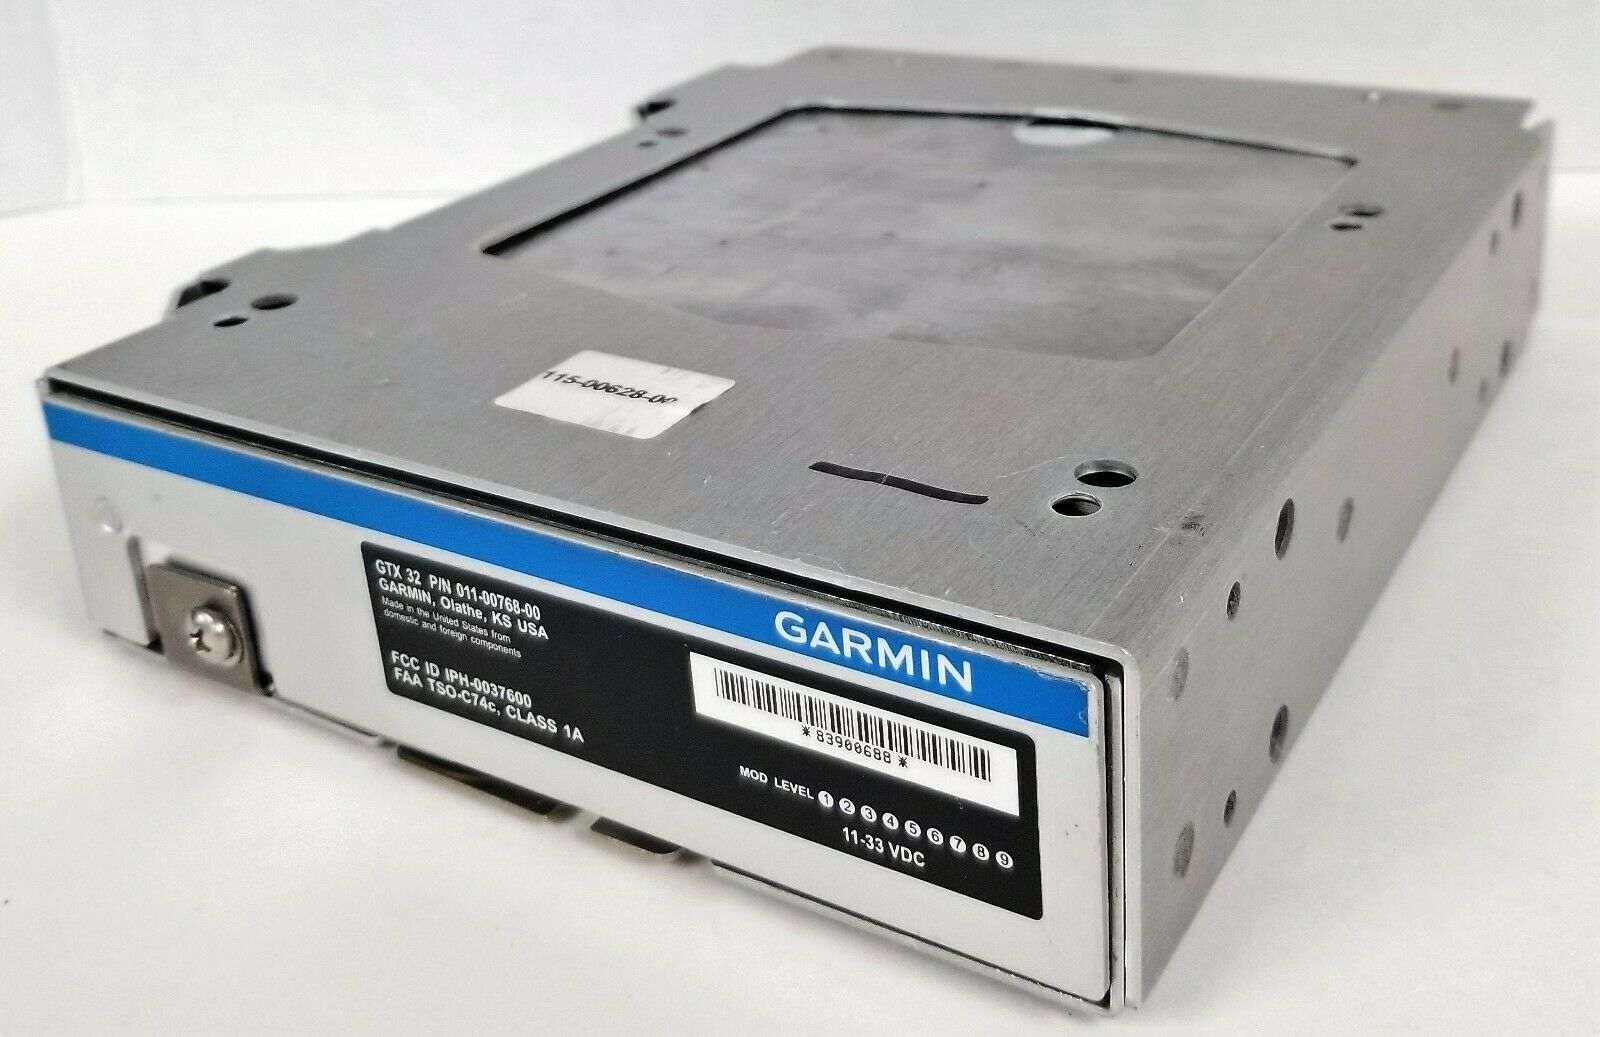 GARMIN GTX-32 TRANSPONDER P/N: 011-00768-00